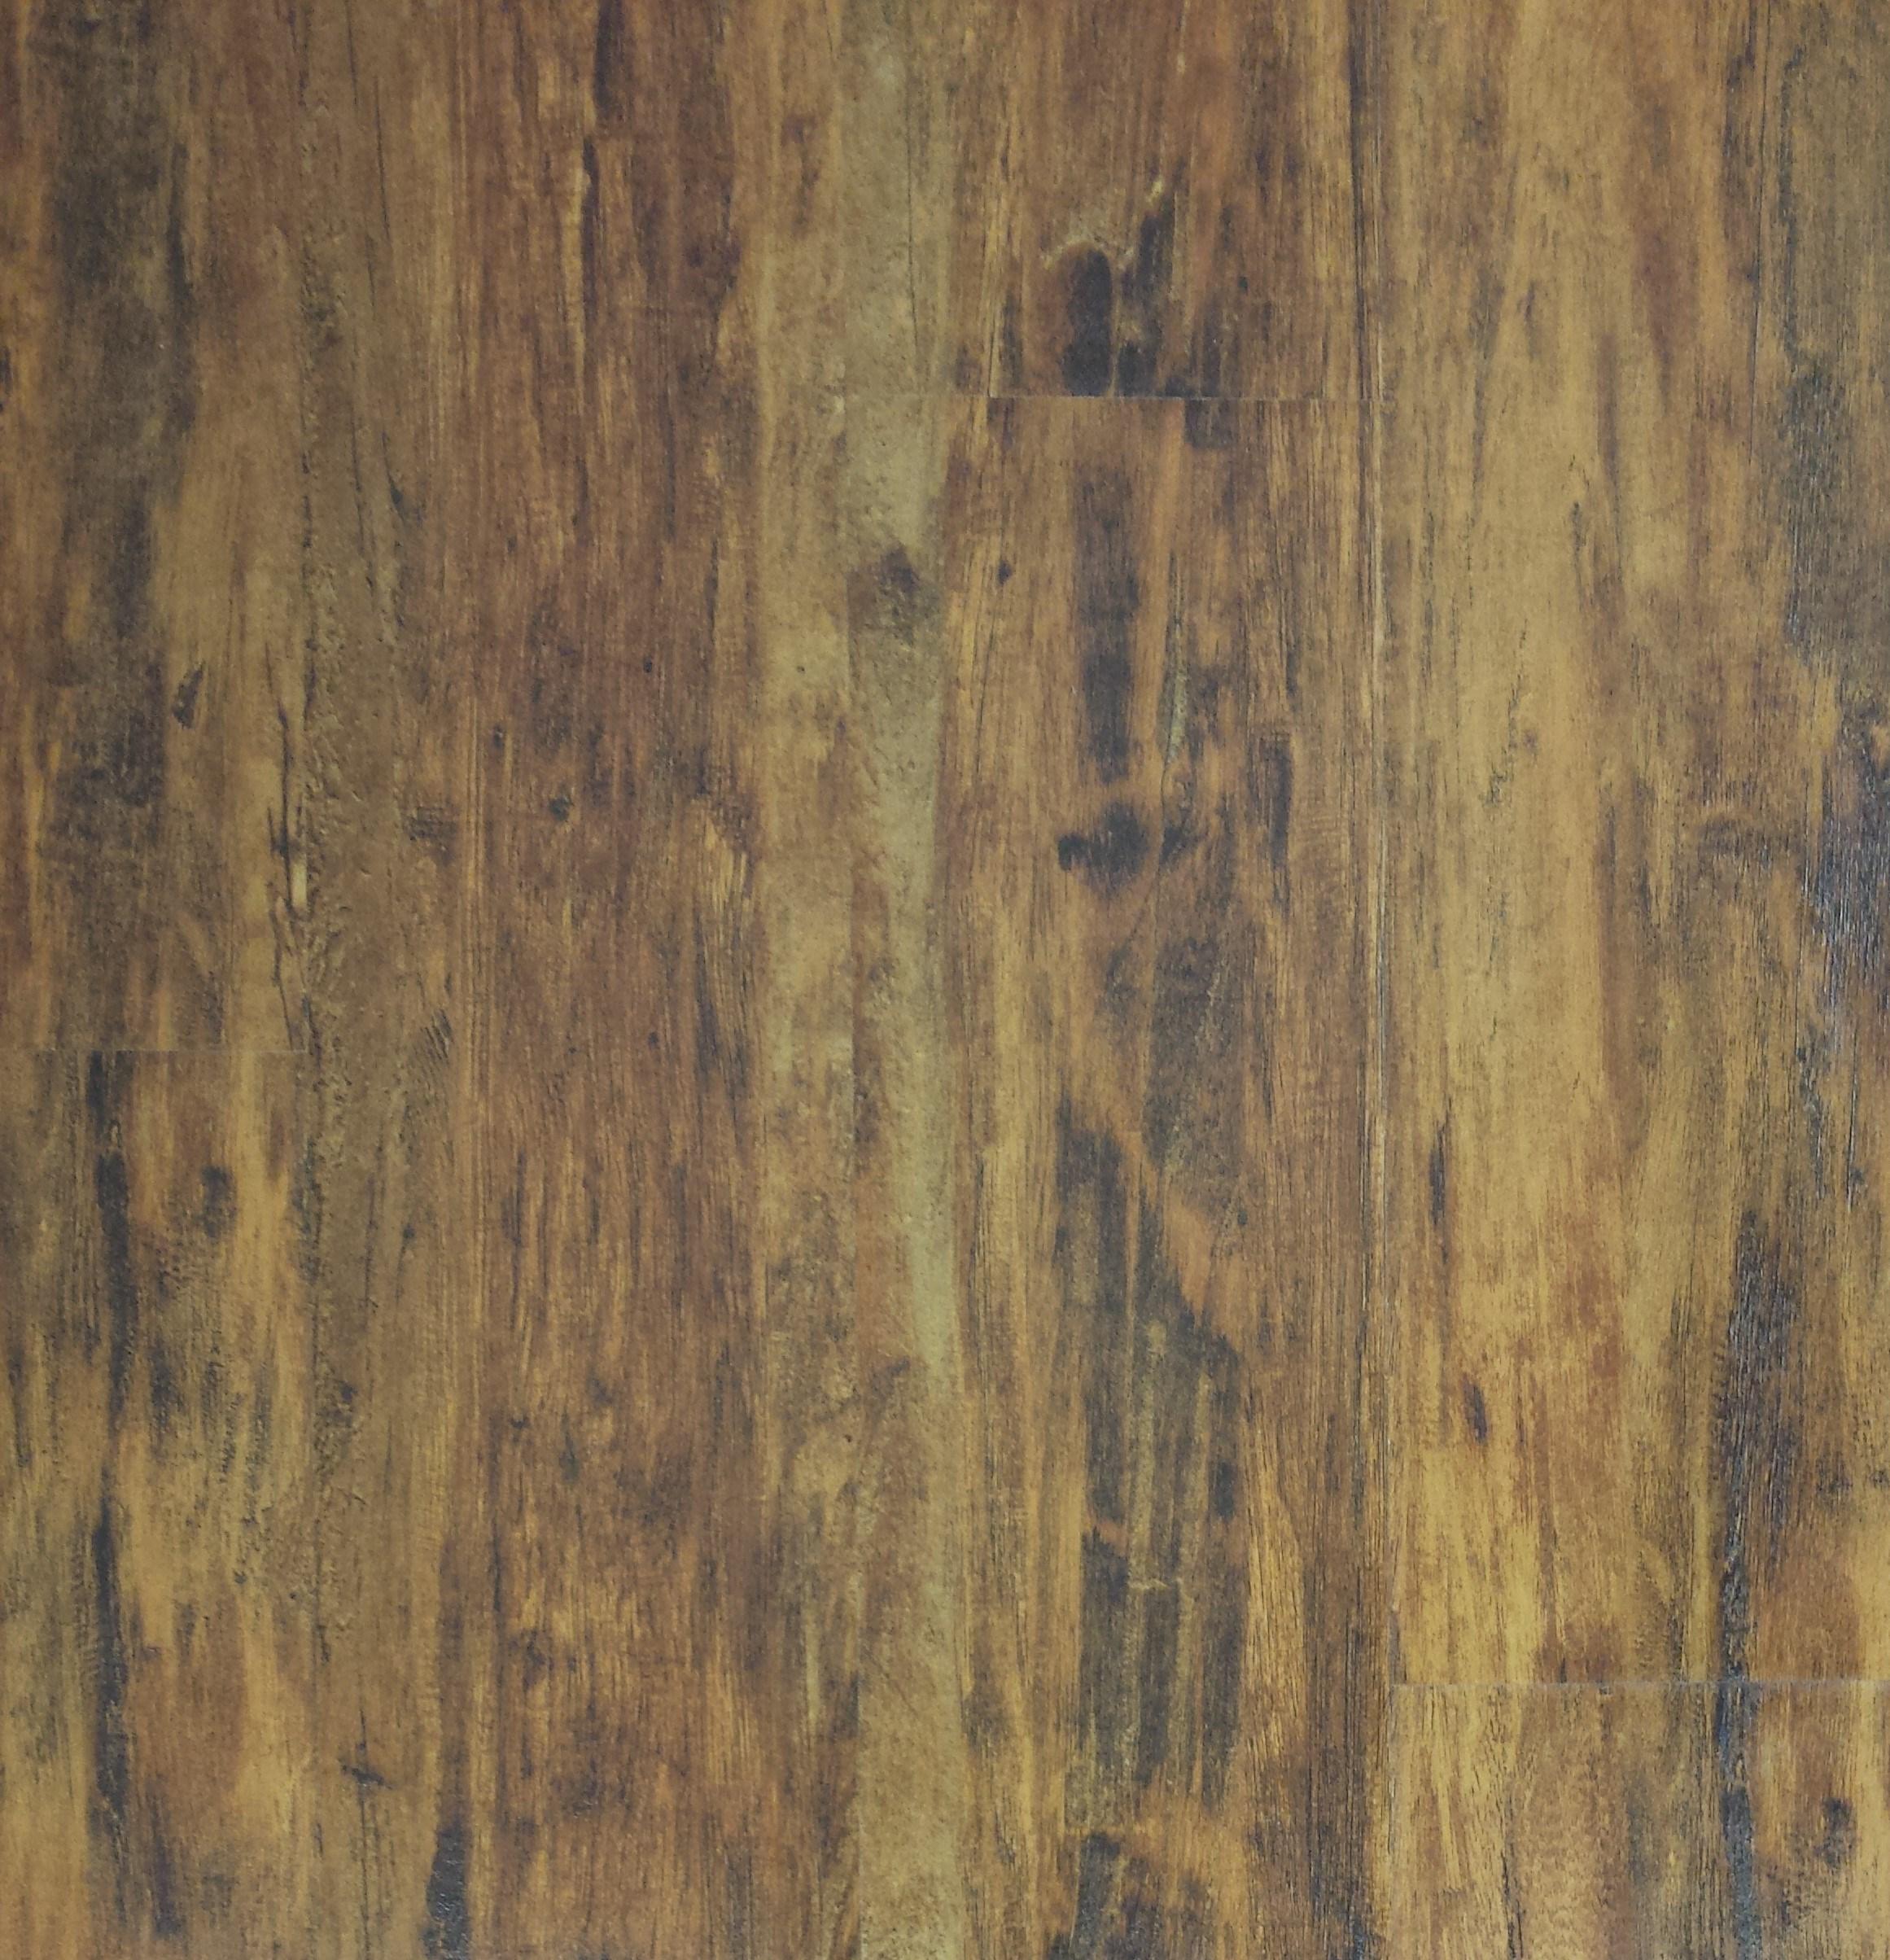 LH383 - Harvest Plank